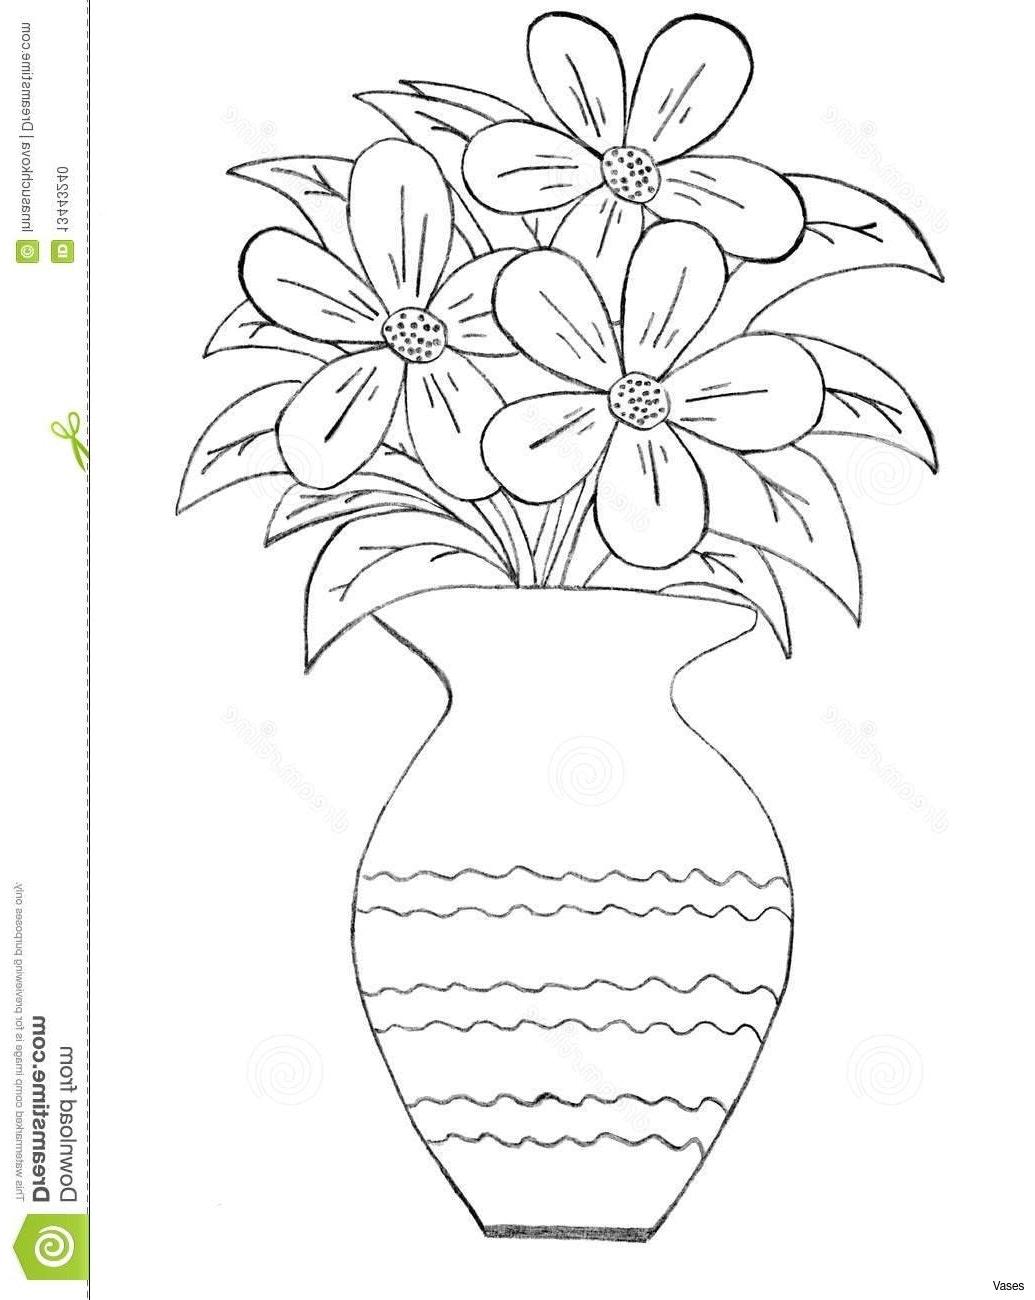 1035x1300 Drawn Vase Full Flower 3h Vases Drawings Pin 7i 18d Dihizb